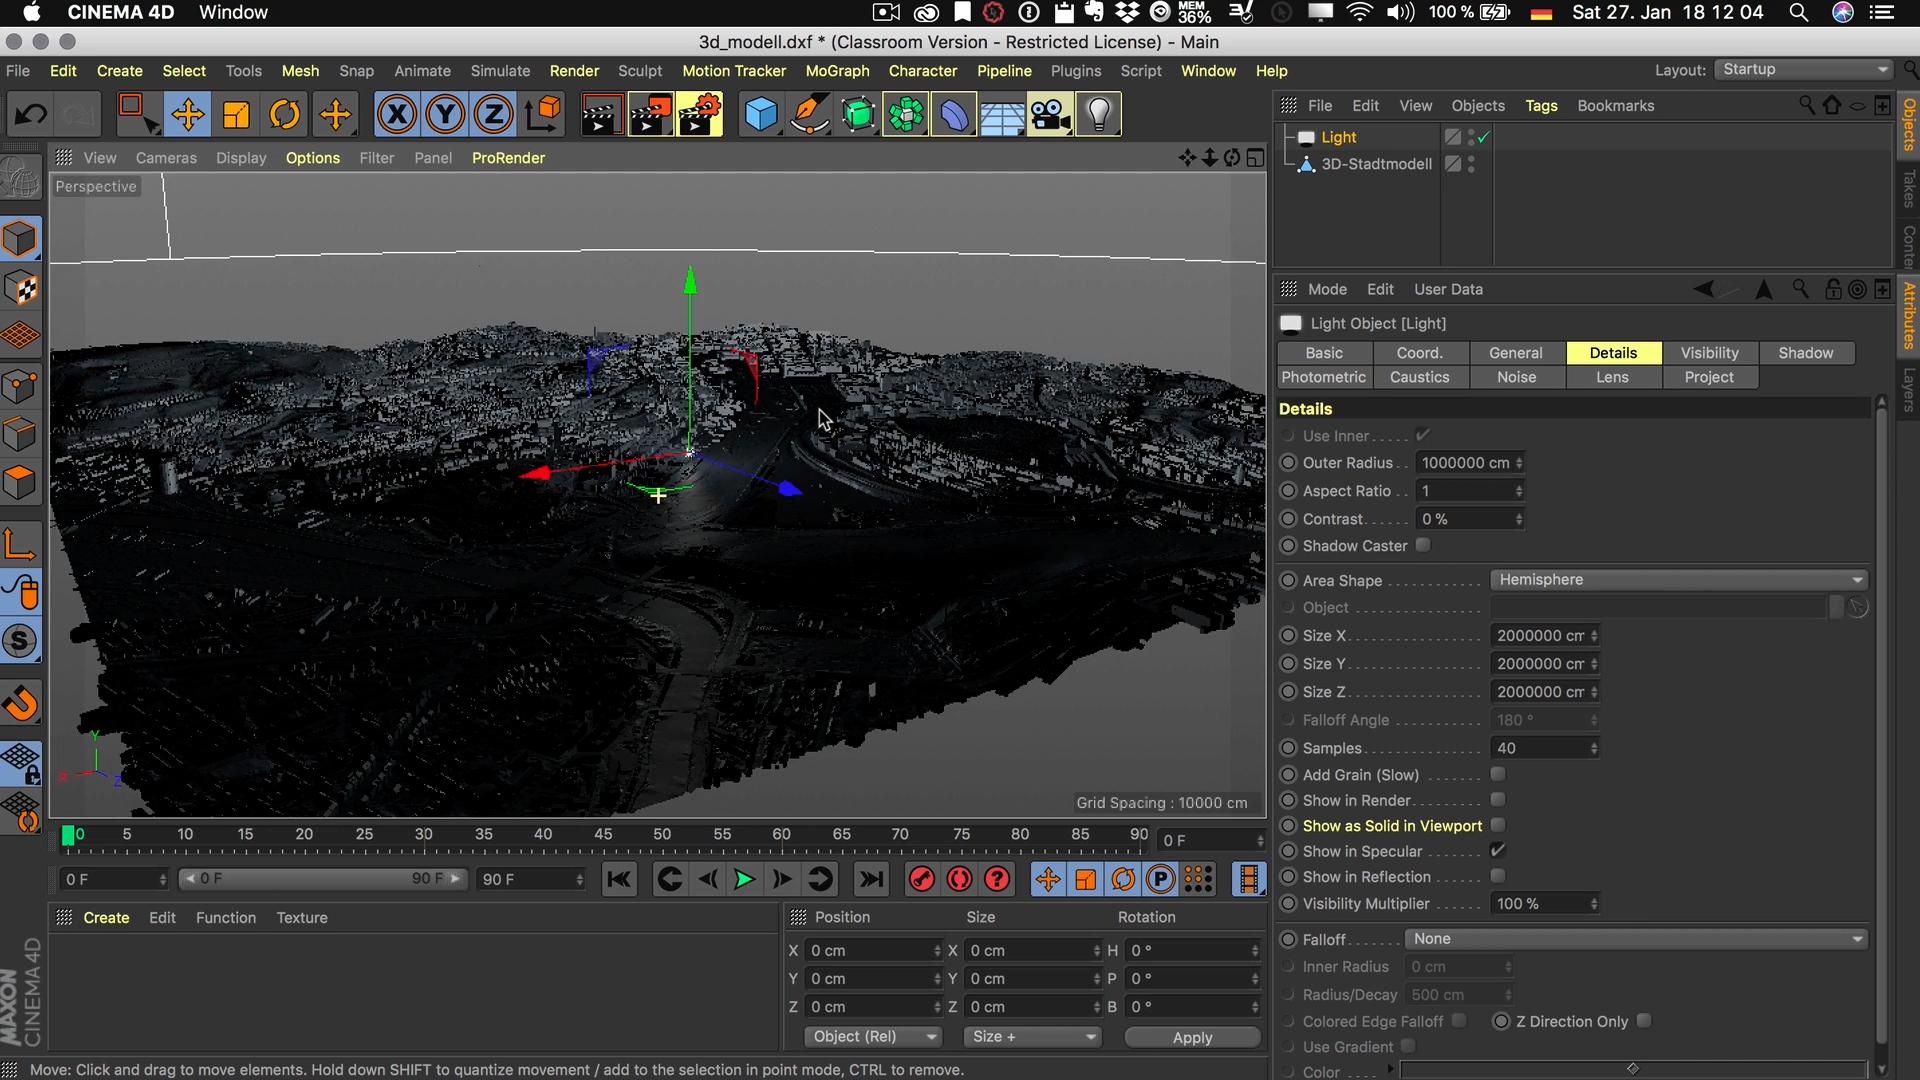 Cinema4D 3D-Stadtmodell Flächenlicht Halbkugel Radius Größe